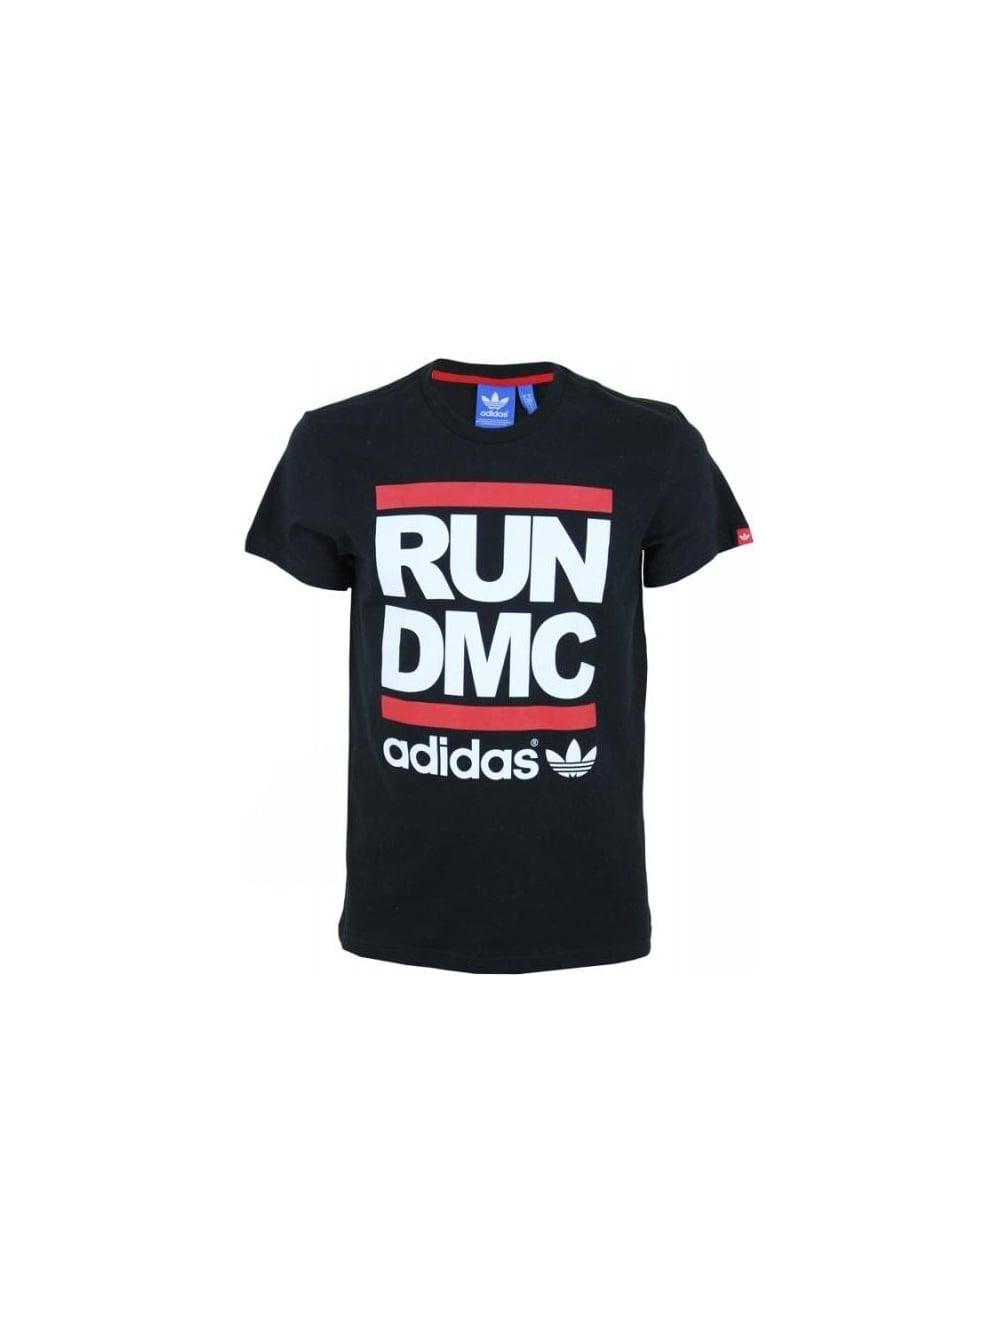 adidas originals x run dmc logo t shirt in black. Black Bedroom Furniture Sets. Home Design Ideas